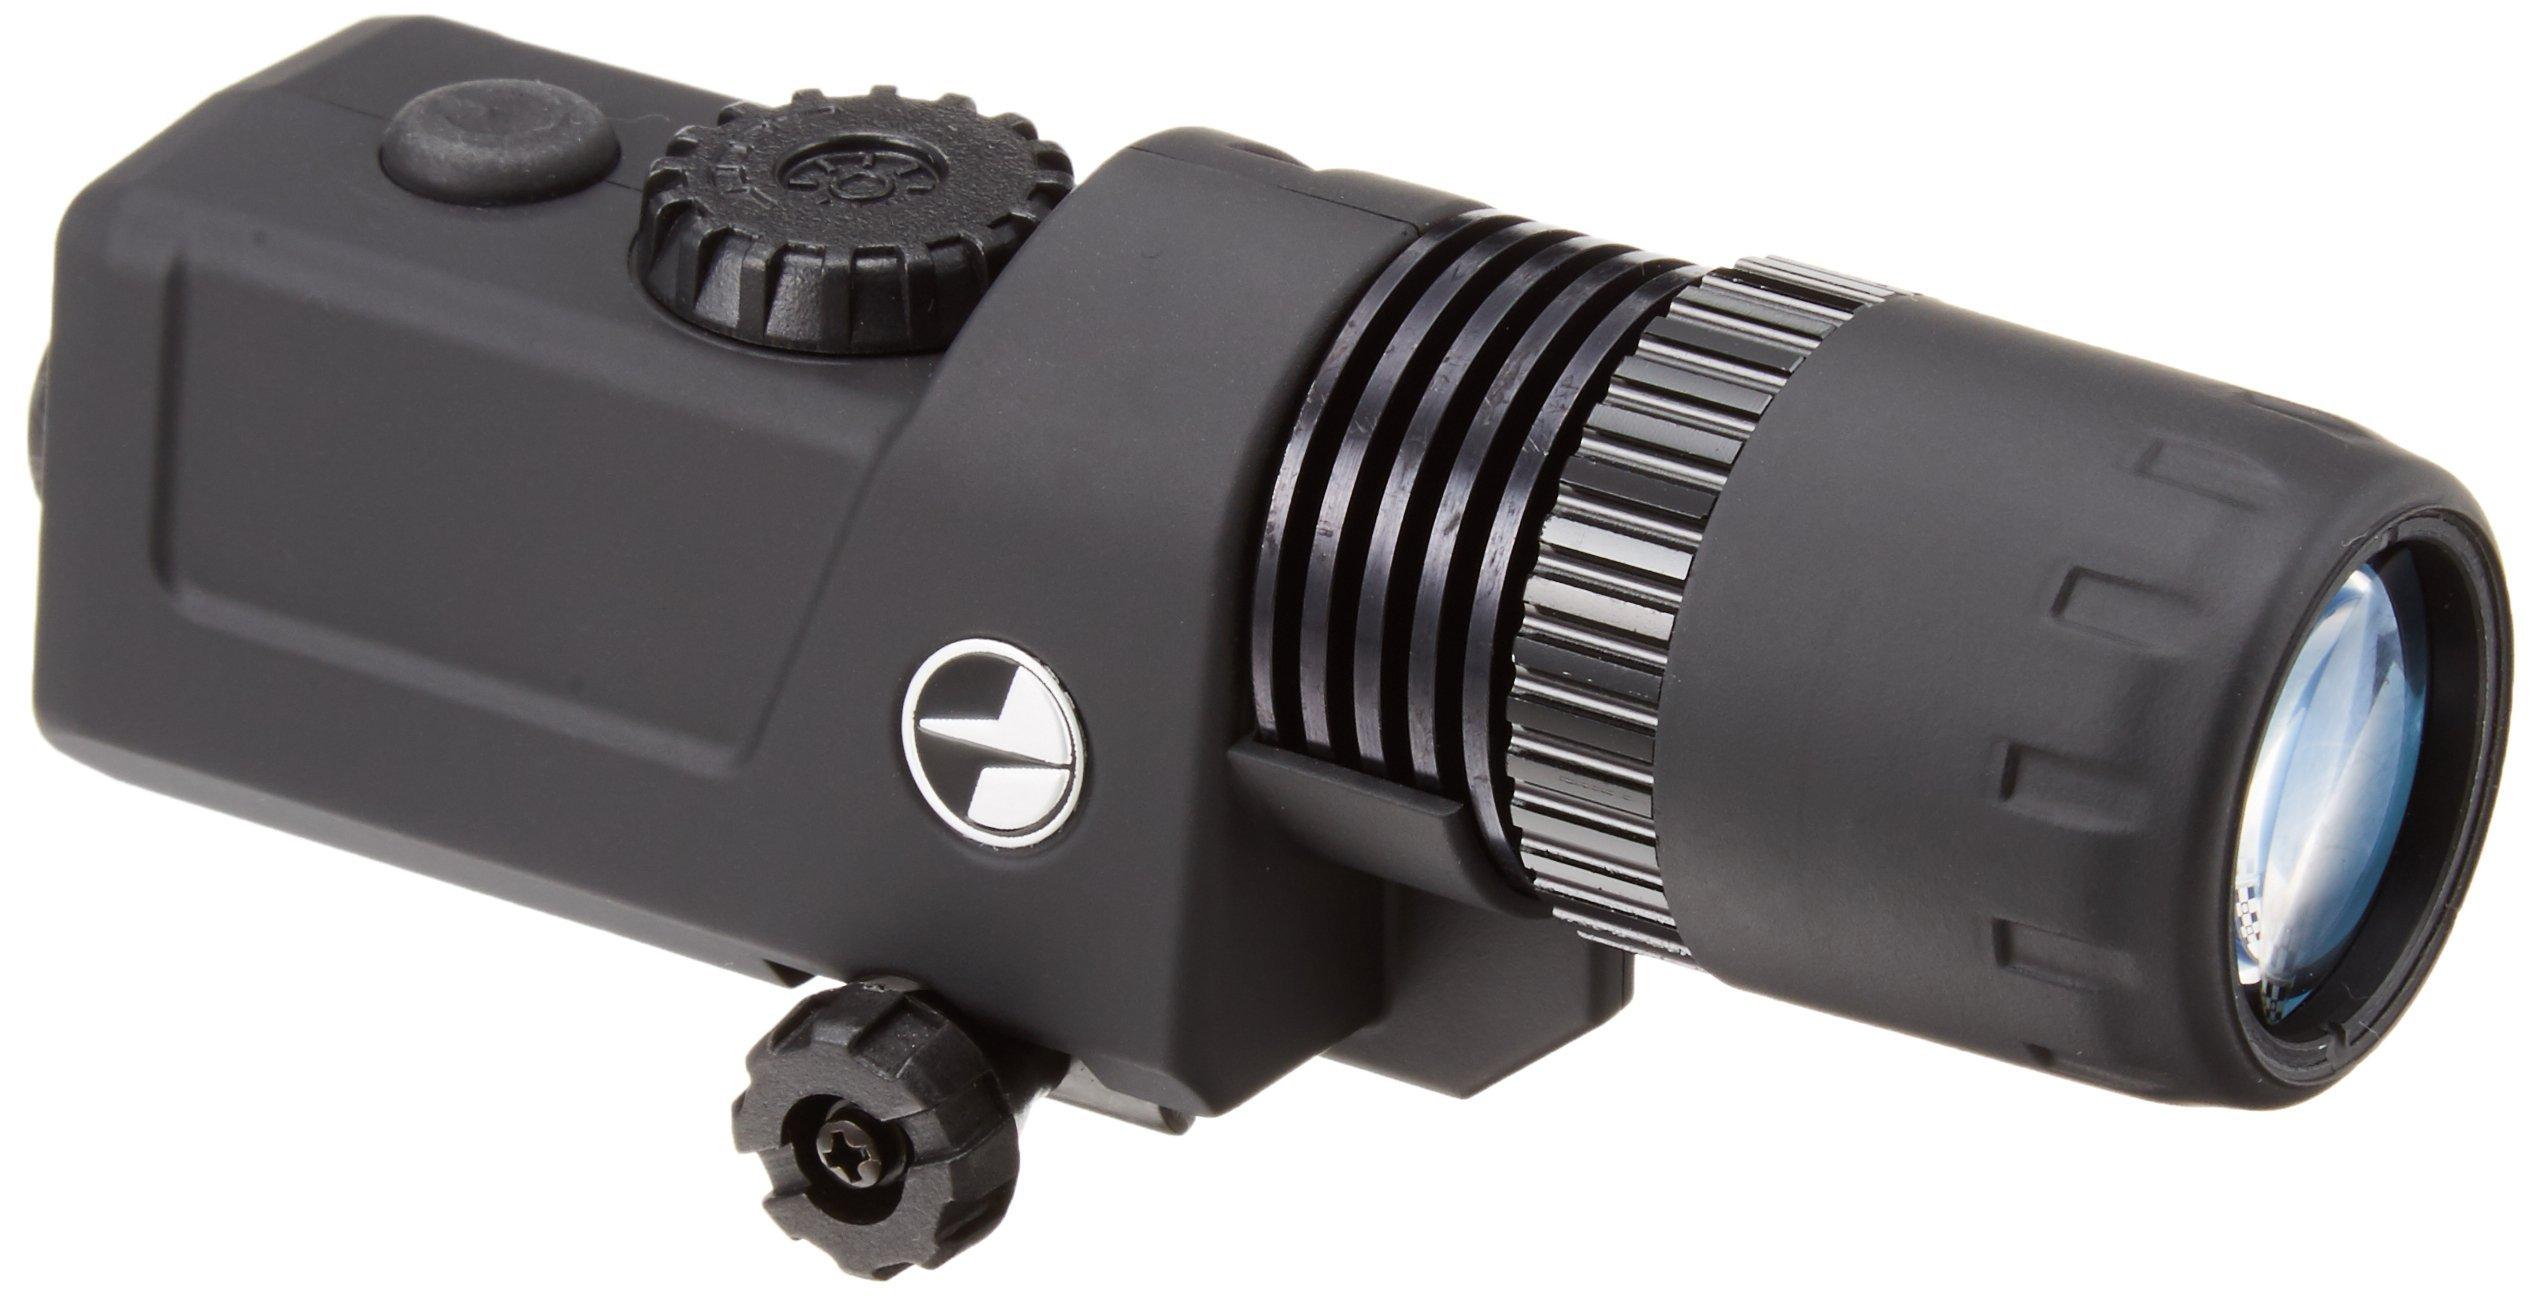 Pulsar PL79076 940 IR Flashlight Night Vision Accessories (Certified Refurbished)